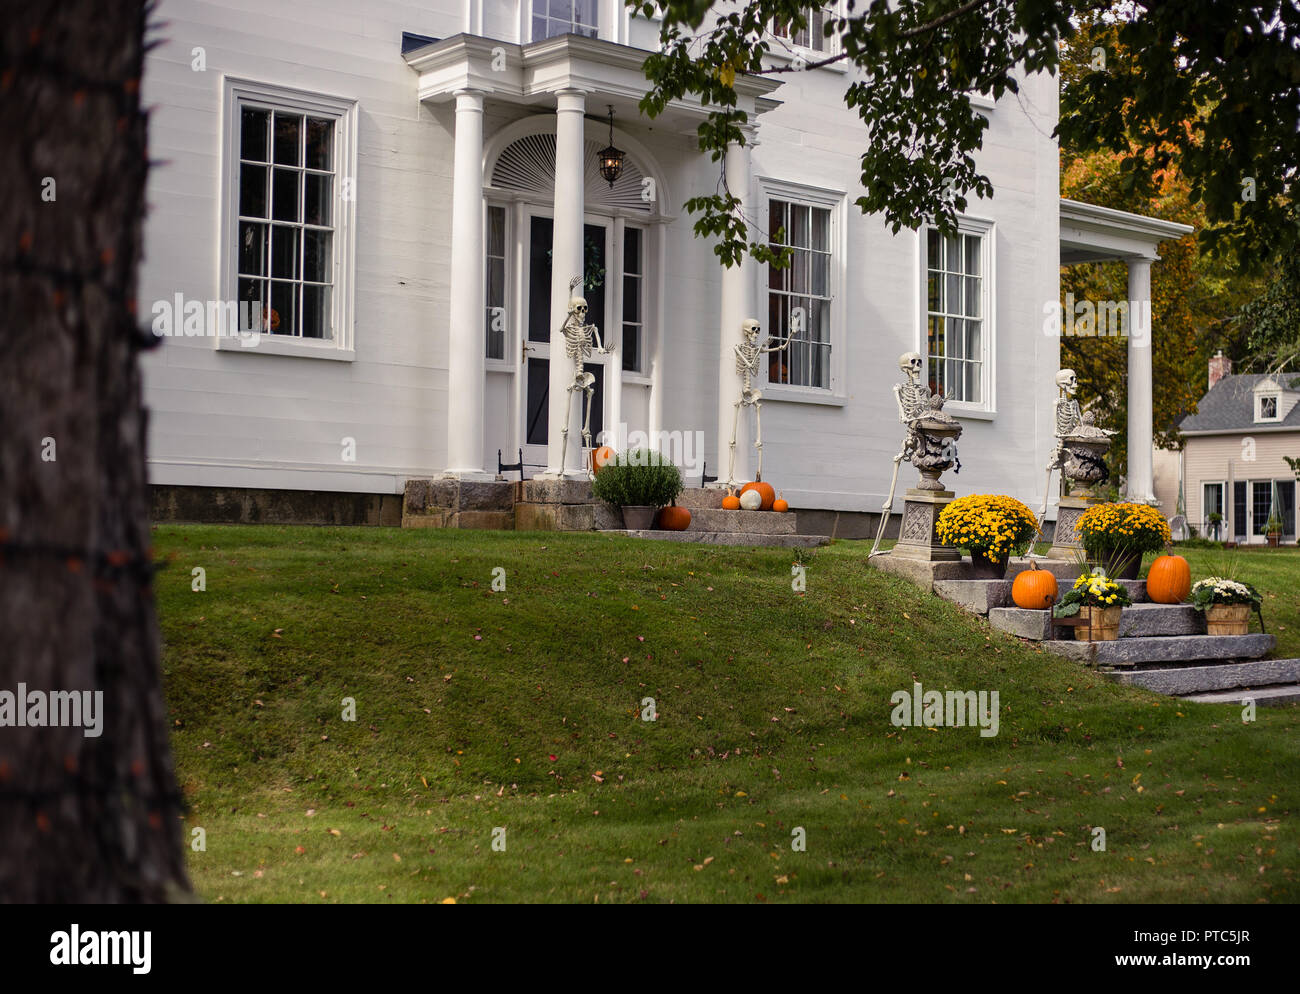 best halloween yard decorations stock photos & best halloween yard